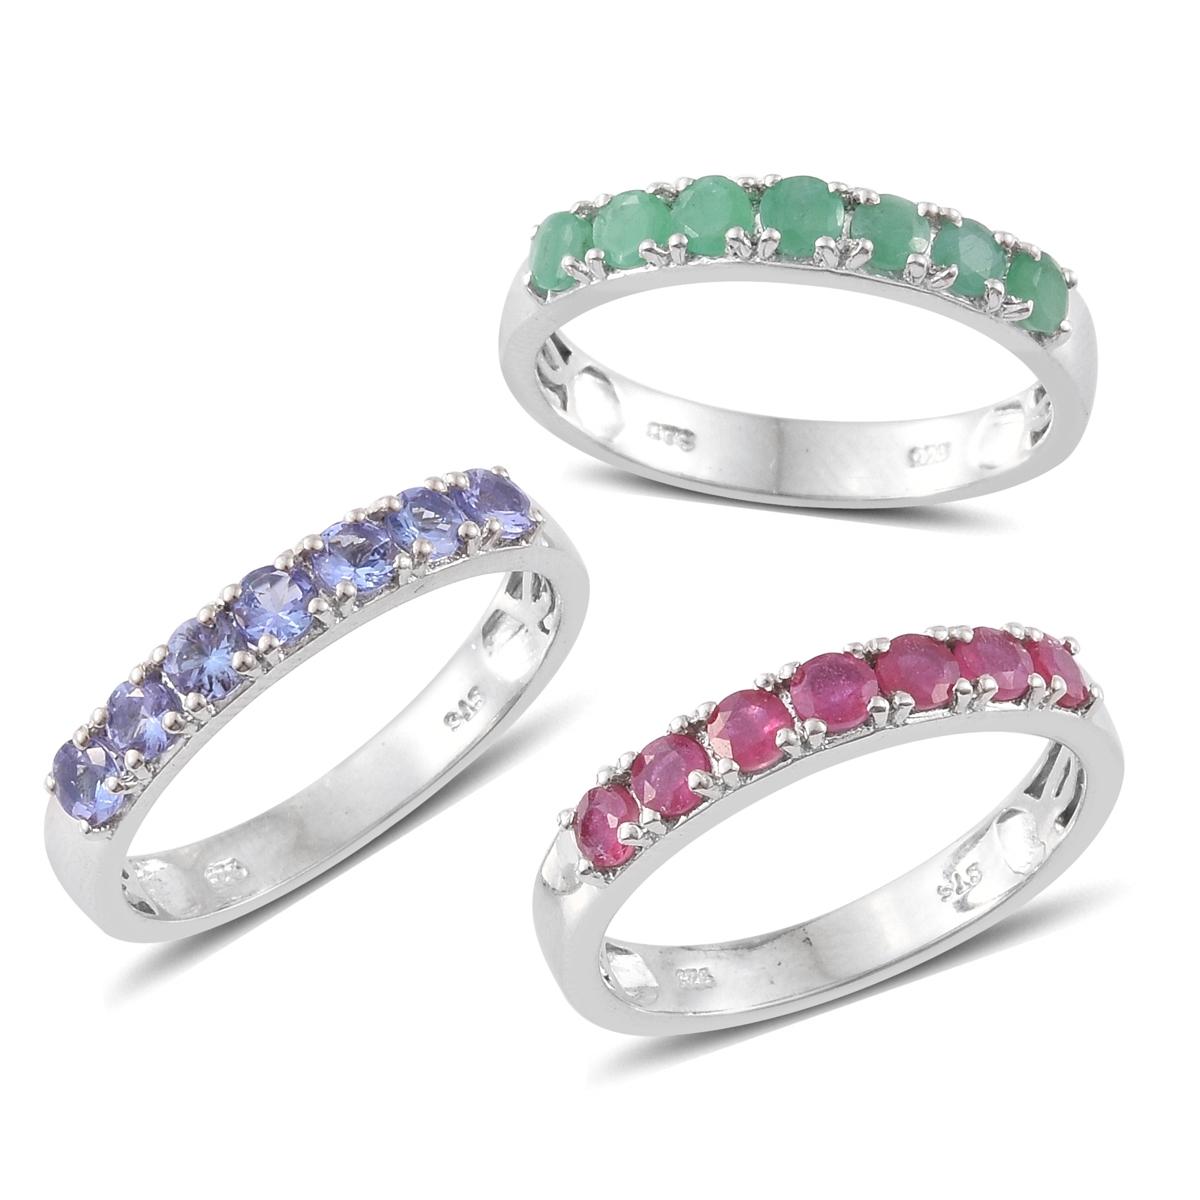 Niassa Ruby, Kagem Zambian Emerald, Tanzanite Platinum Stackable ...